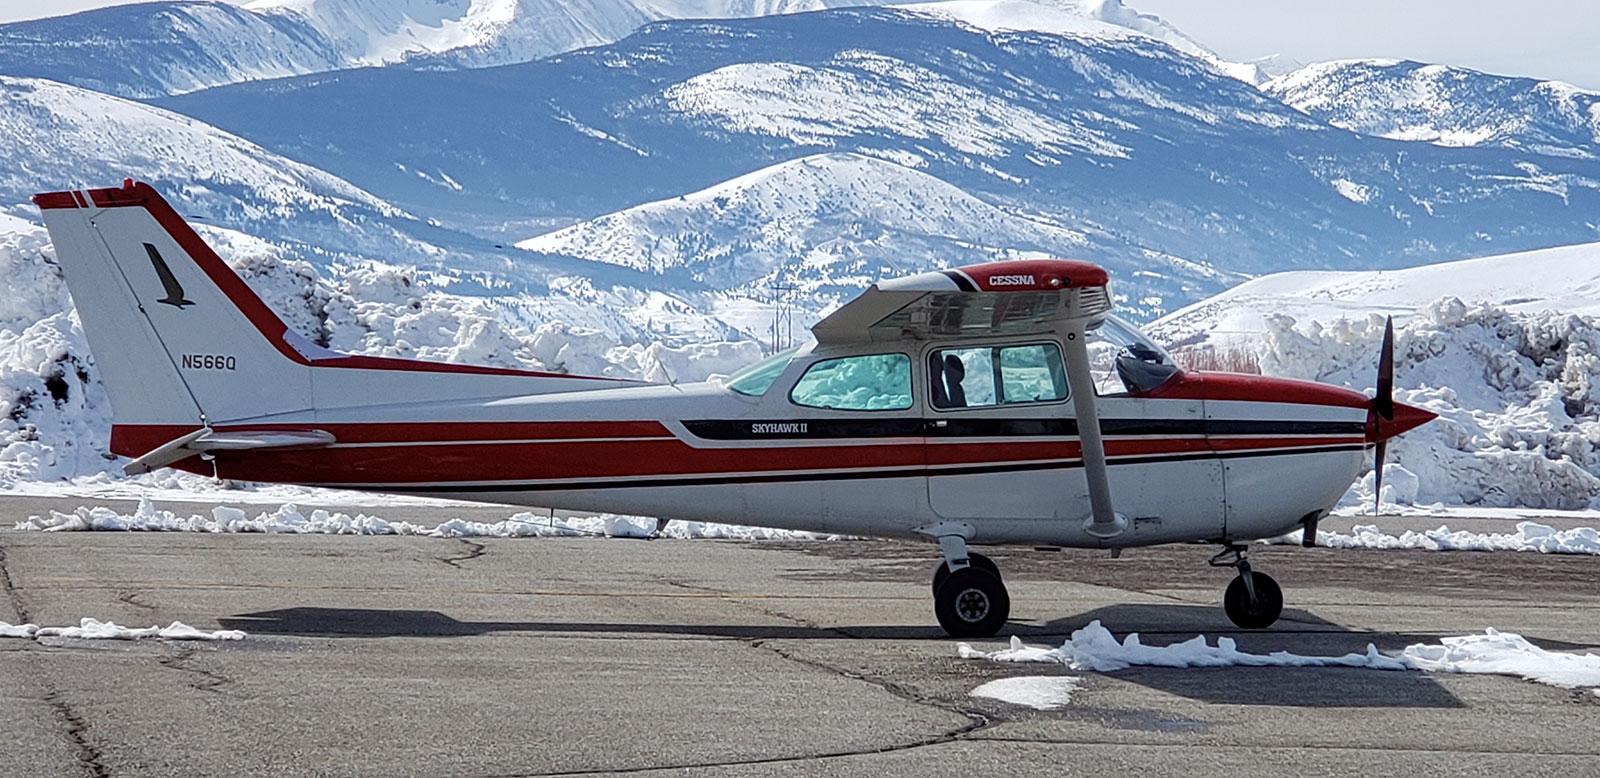 cessna flight training plane